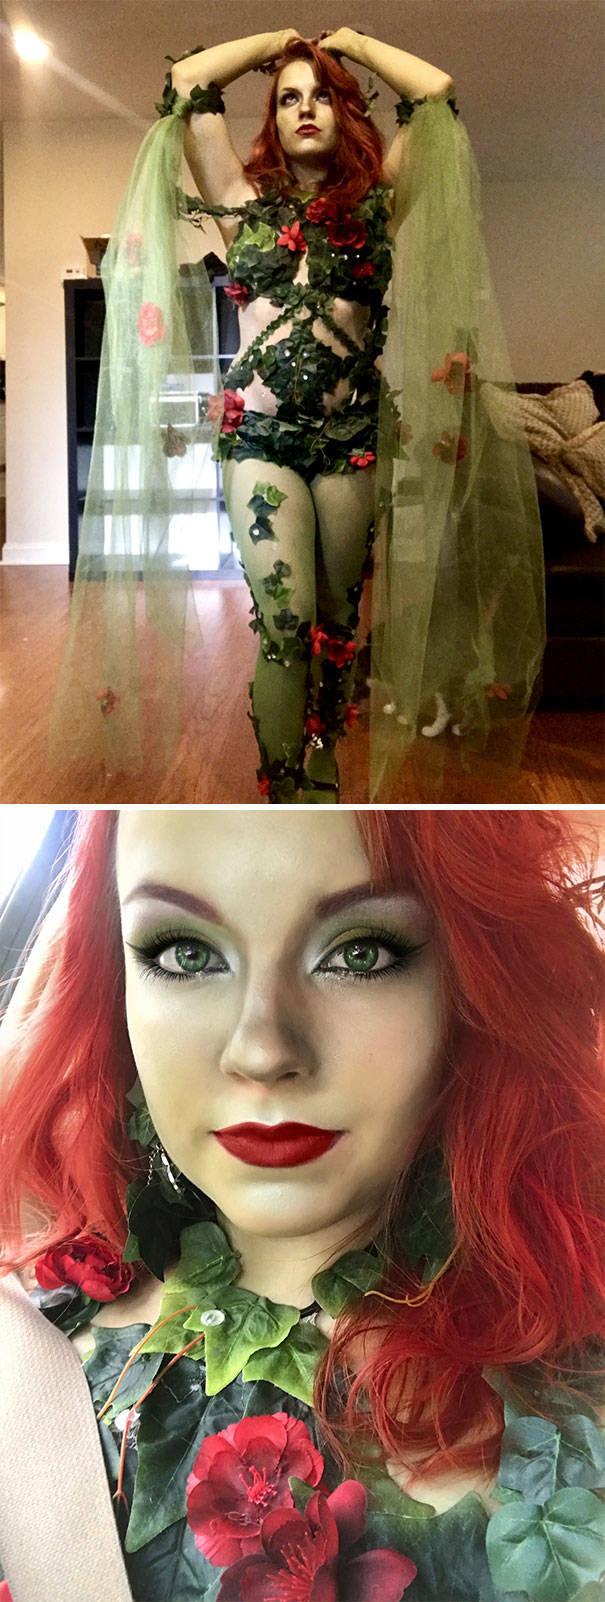 Awesome Halloween Costume Ideas (50 pics)